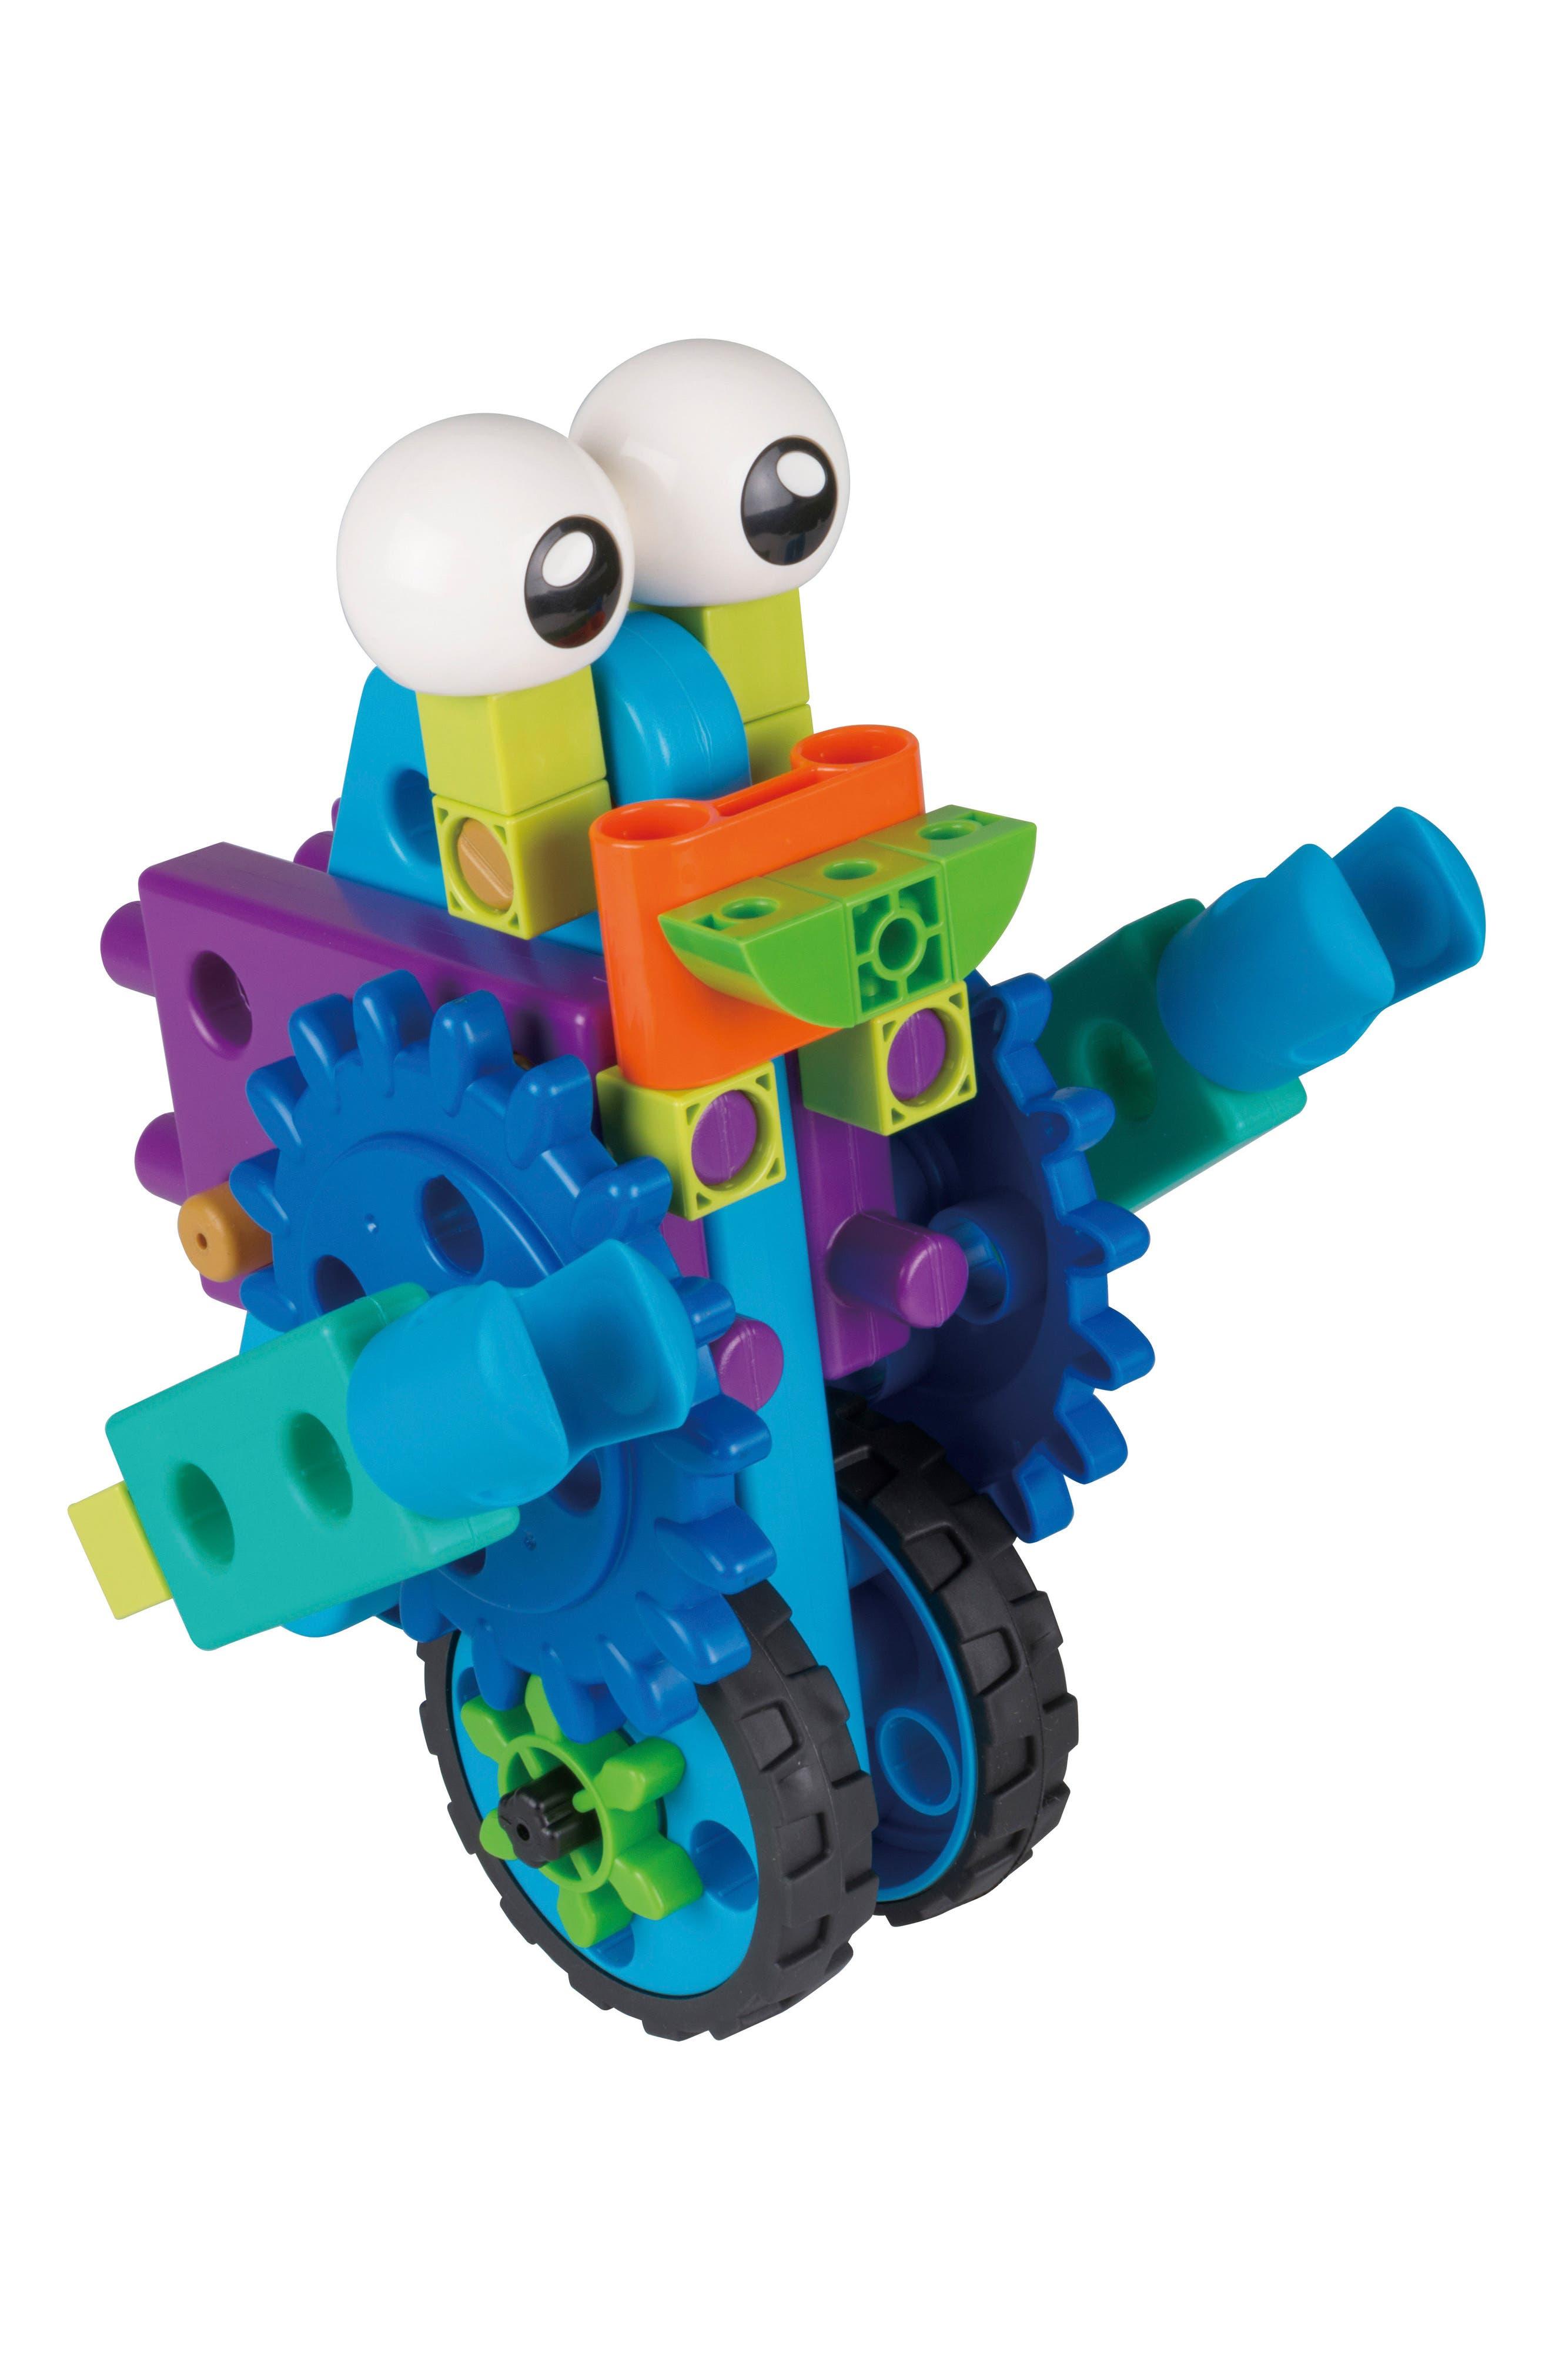 Robot Engineer Building Set & Storybook,                             Alternate thumbnail 9, color,                             Blue